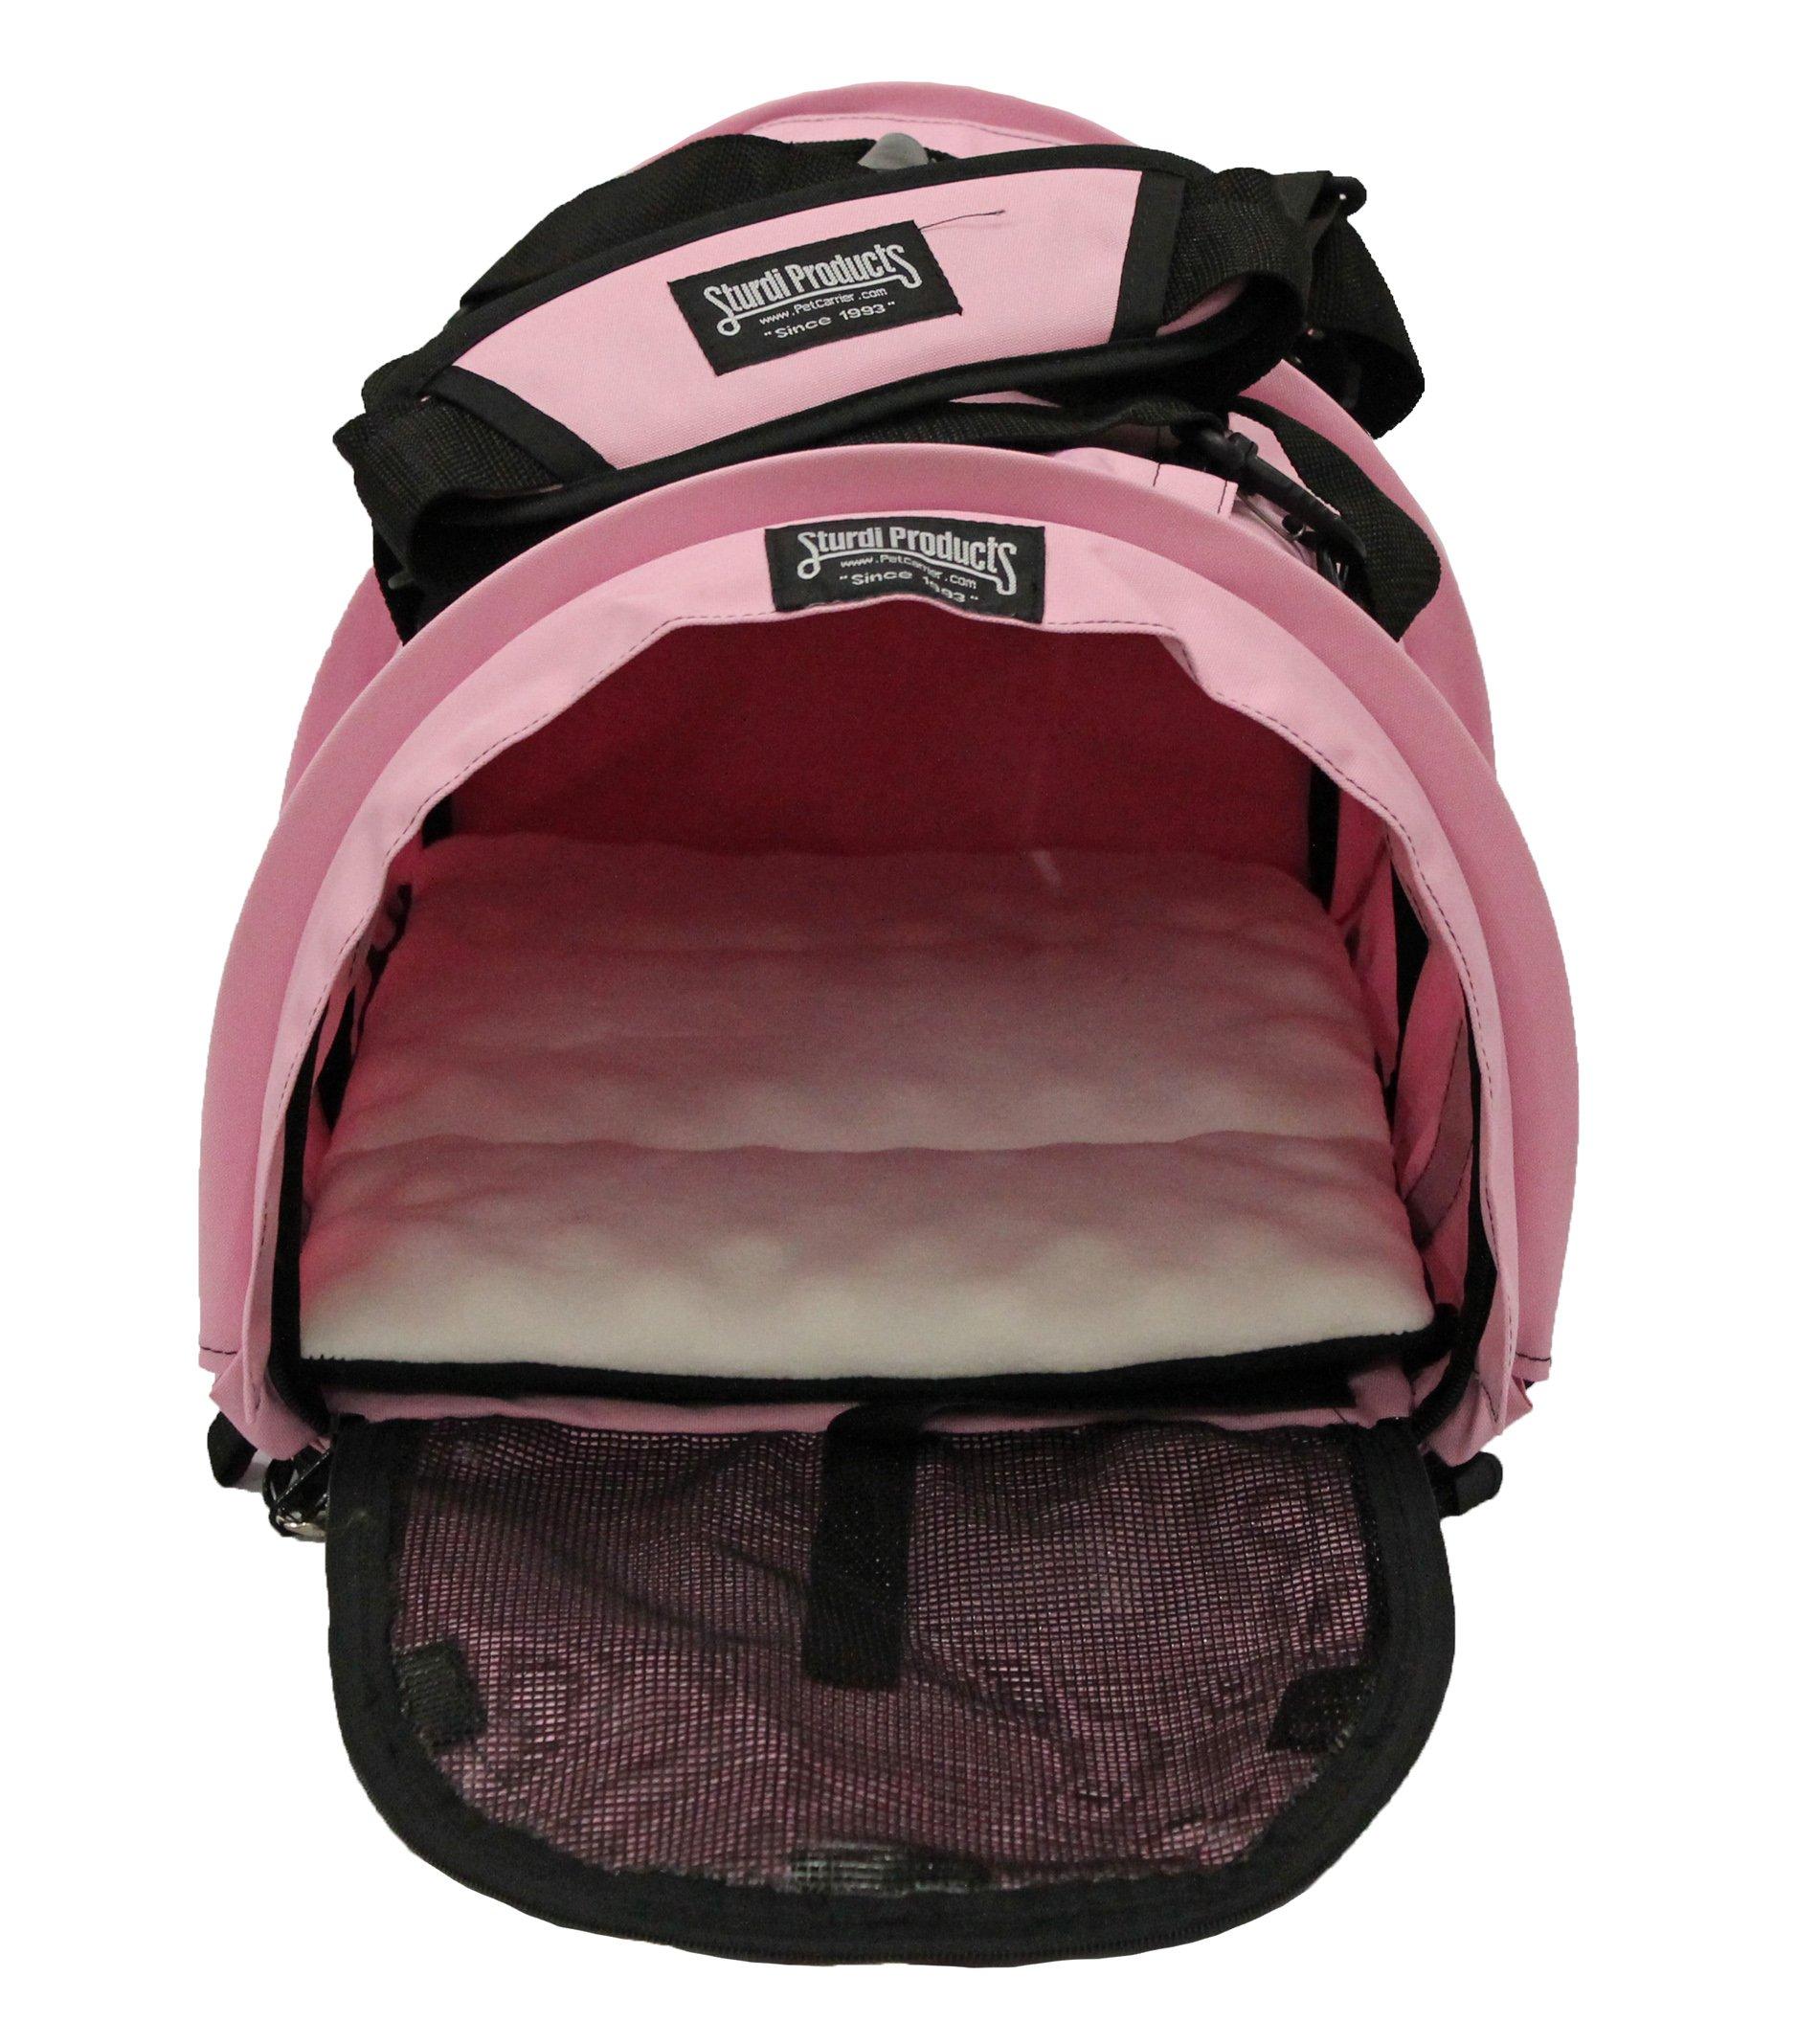 STURDI PRODUCTS SturdiBag Pet Carrier, Large, Soft Pink by STURDI PRODUCTS